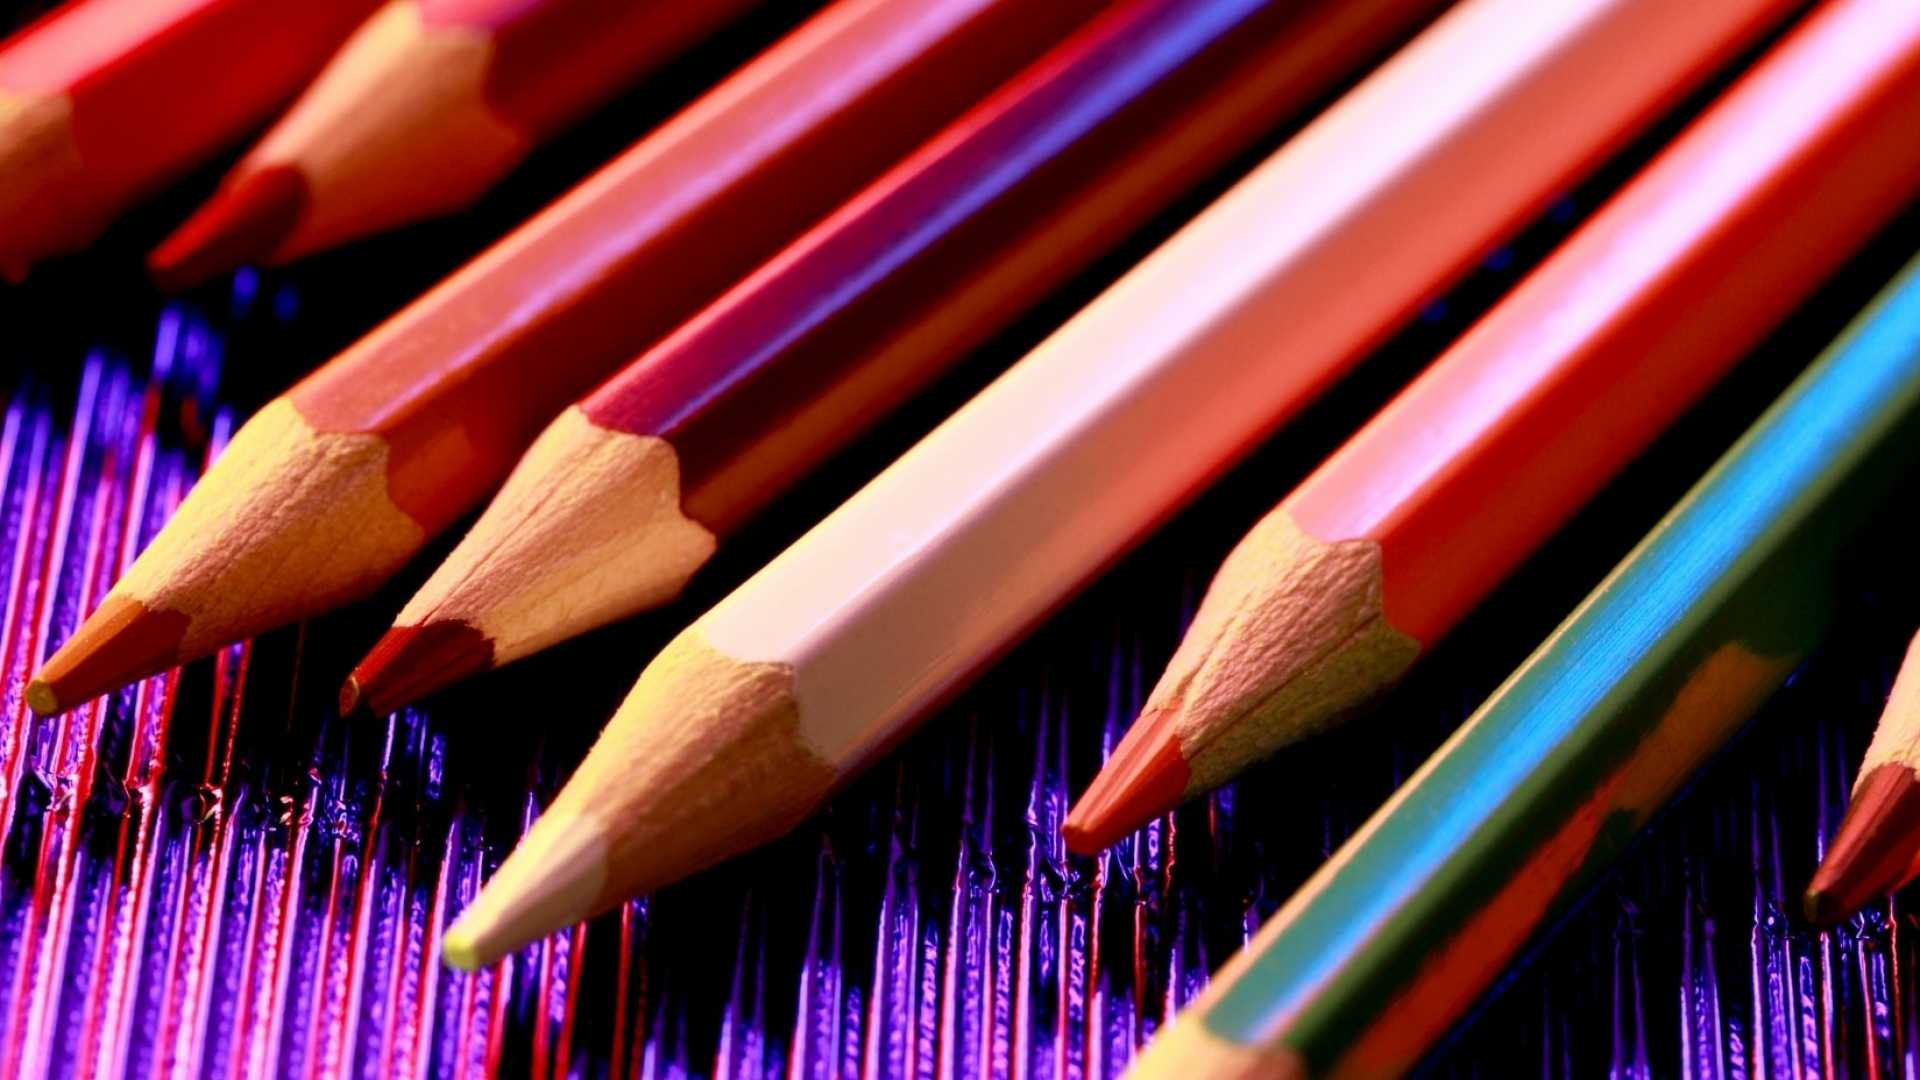 Why Creativity and Innovation Thrive Amid Chaos